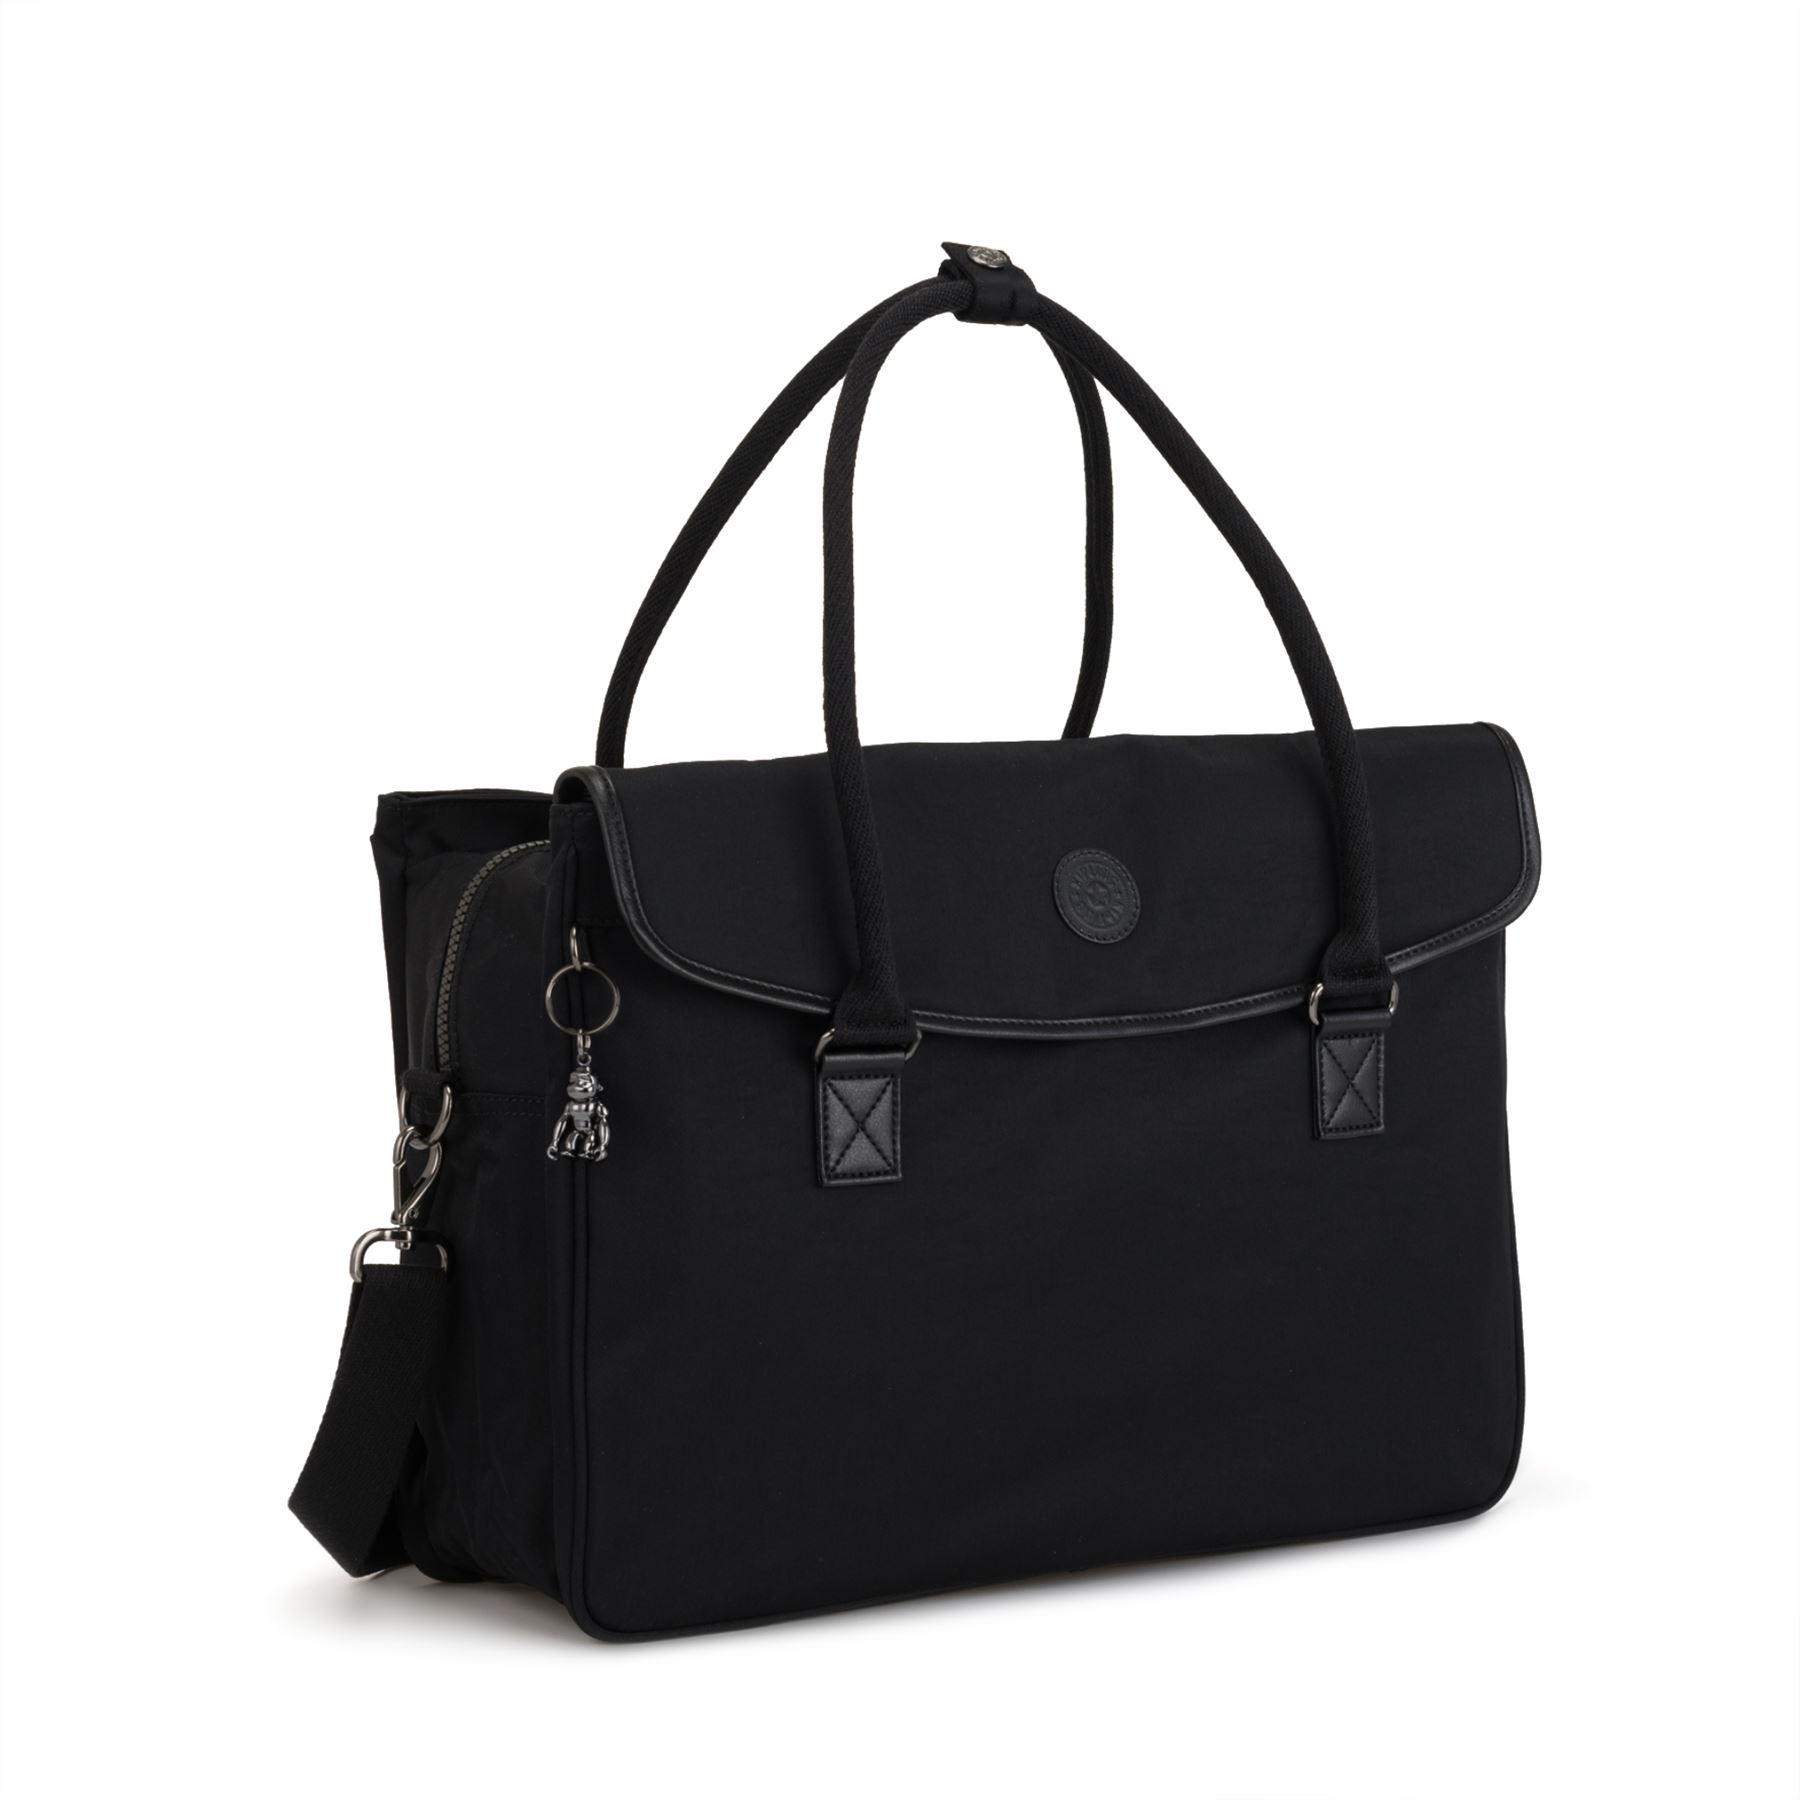 888247a28f Kipling Superwork Womens Laptop Bag, with Organiser & Adjustable ...